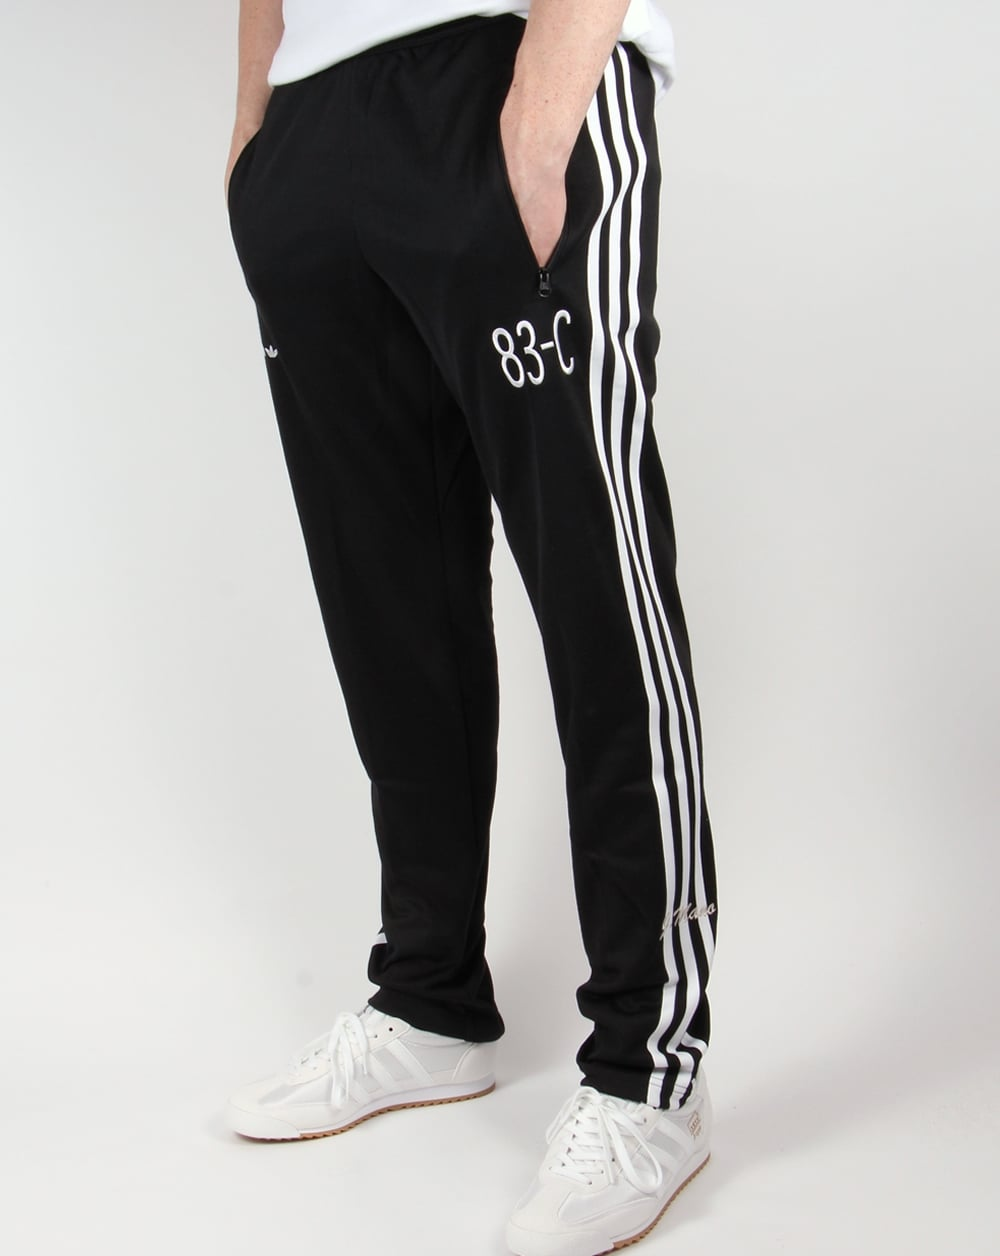 Adidas Originals 83-C Track Pants Black